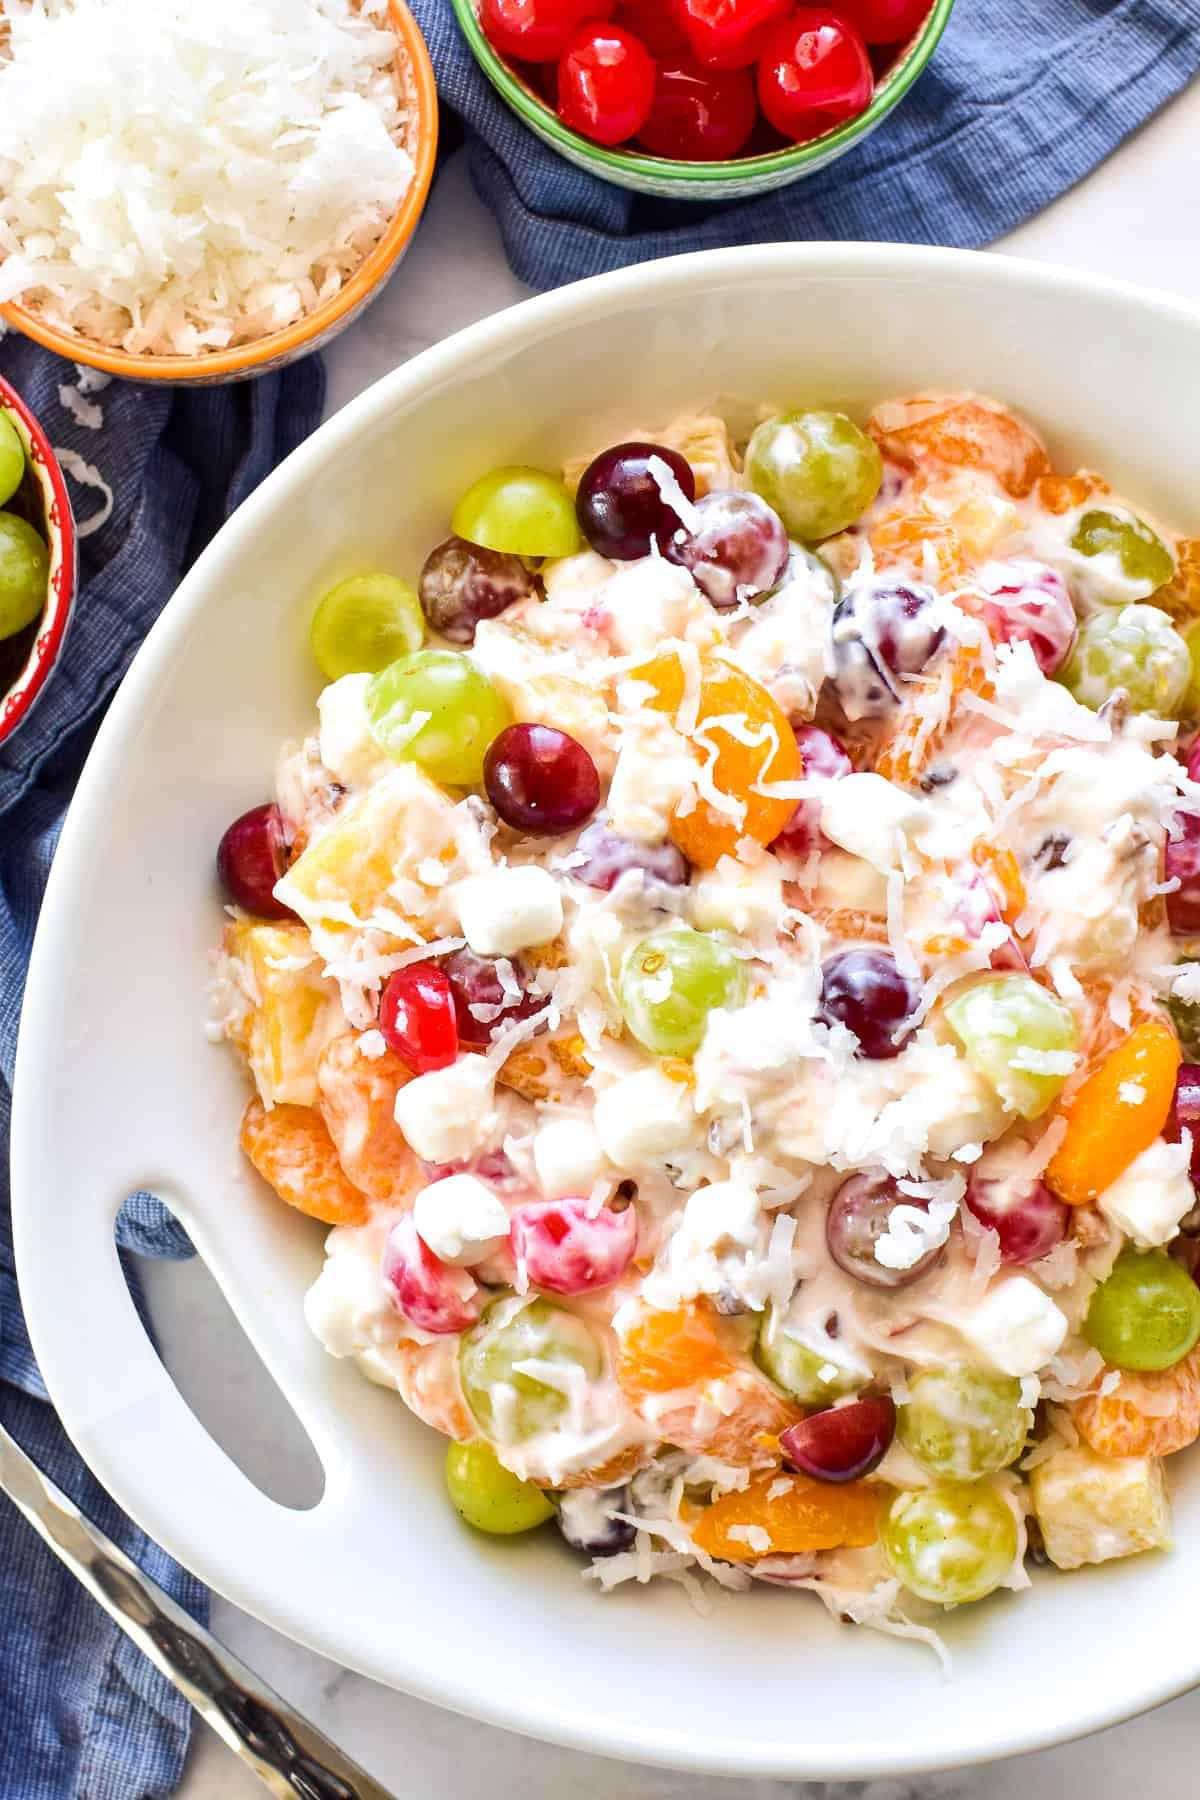 Ambrosia Fruit Salad in serving bowl